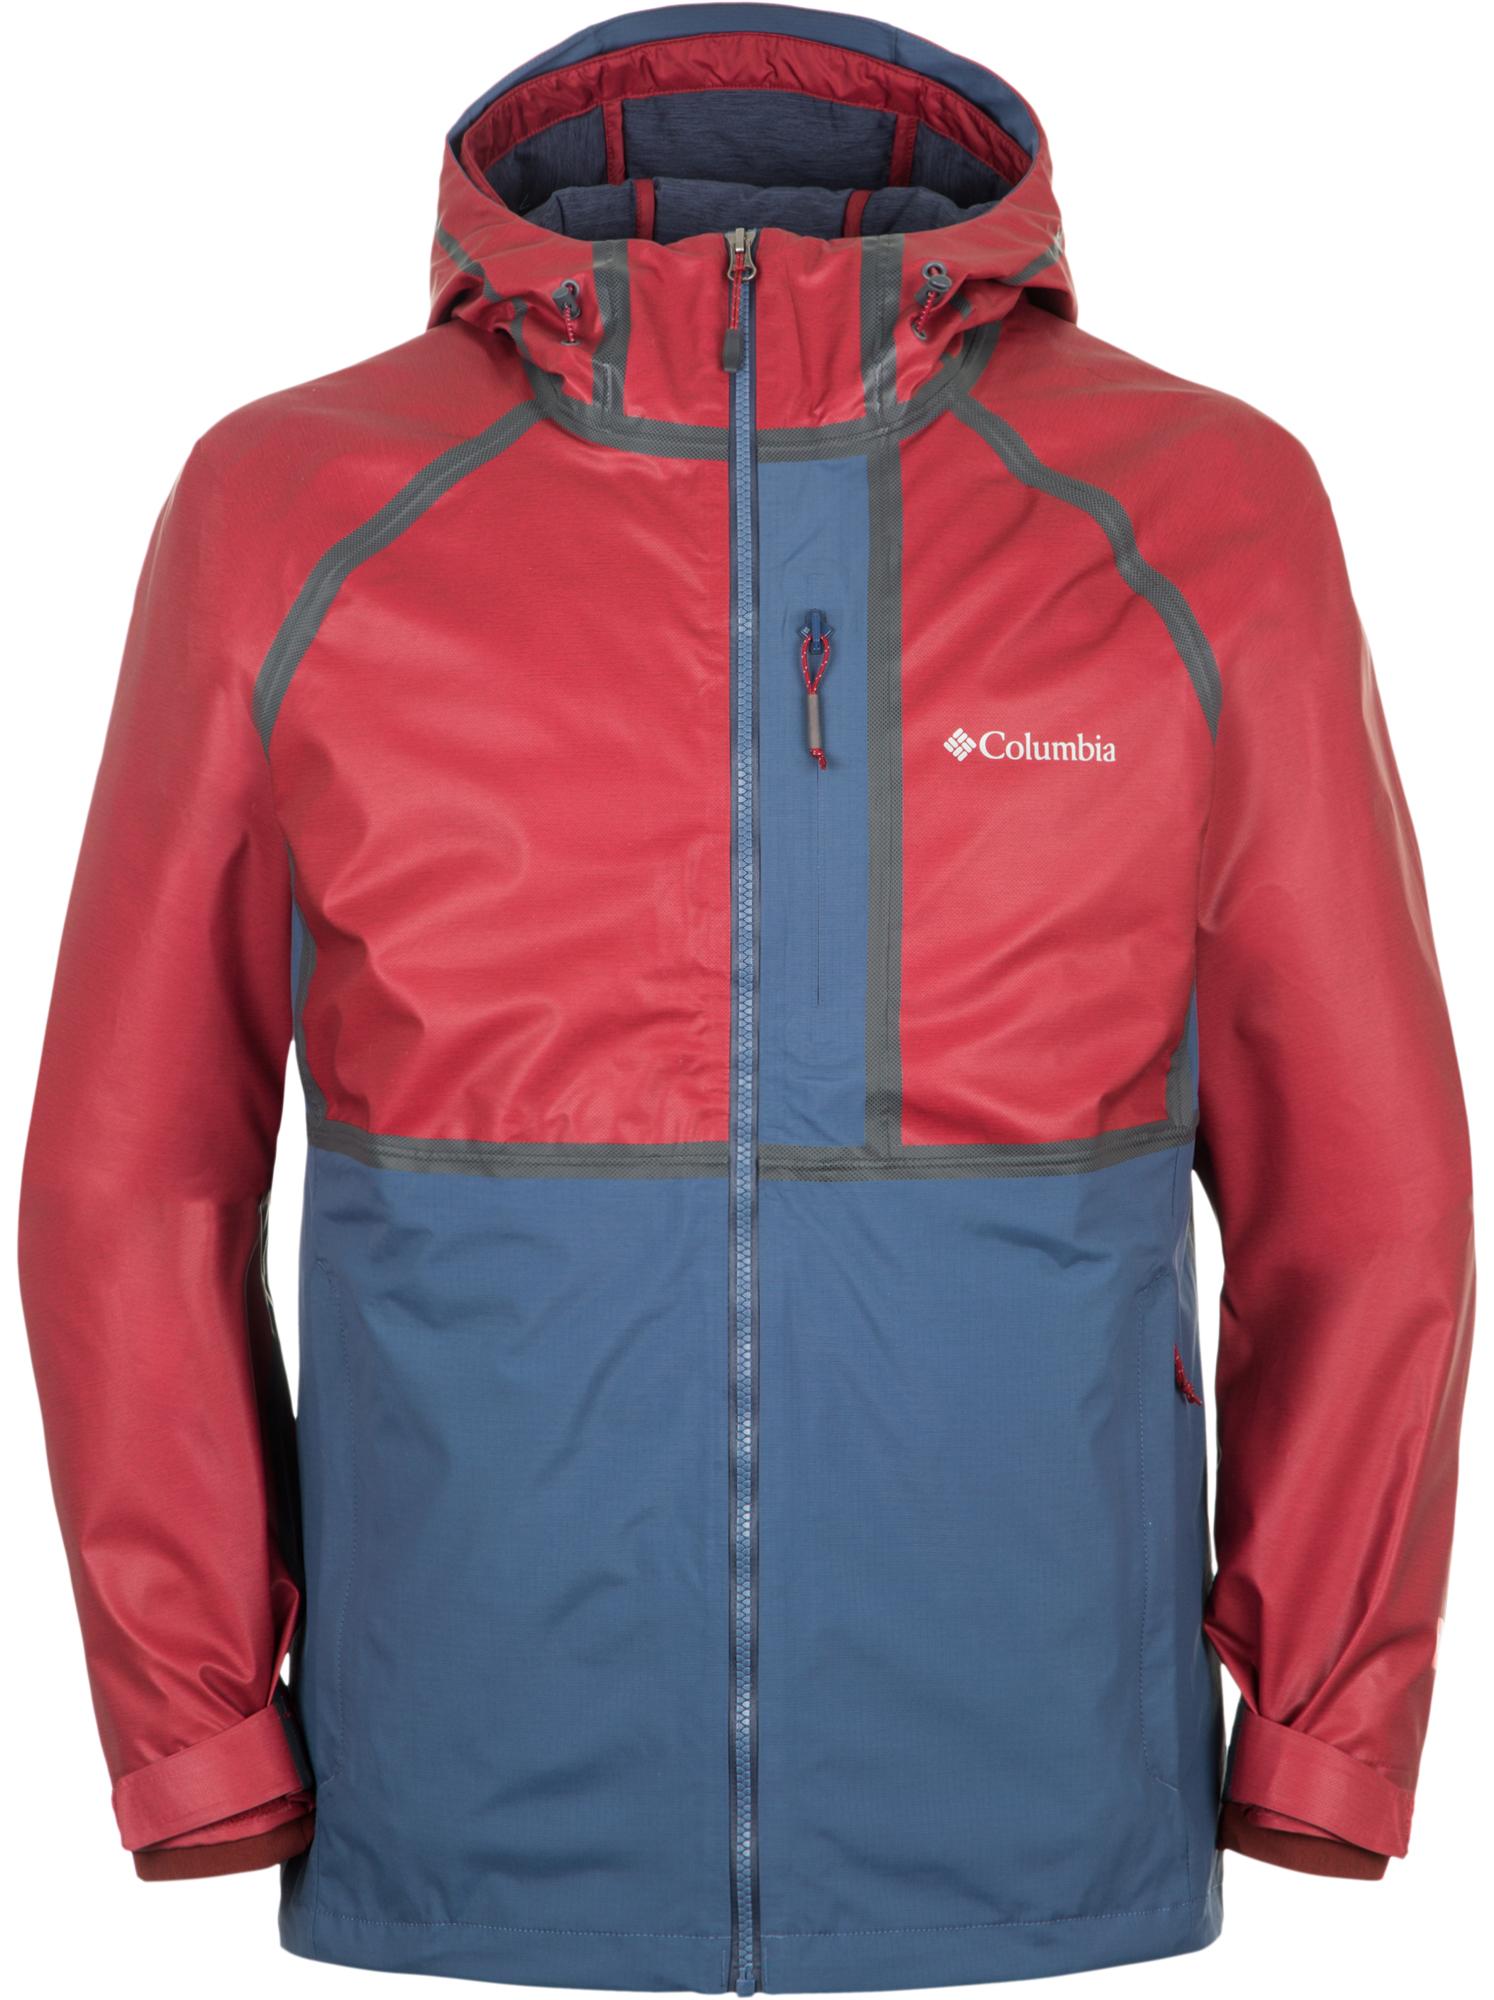 Columbia Куртка 3 в 1 мужская Columbia OutDry Rogue, размер 56-58 columbia куртка 3 в 1 мужская columbia whirlibird размер 48 50